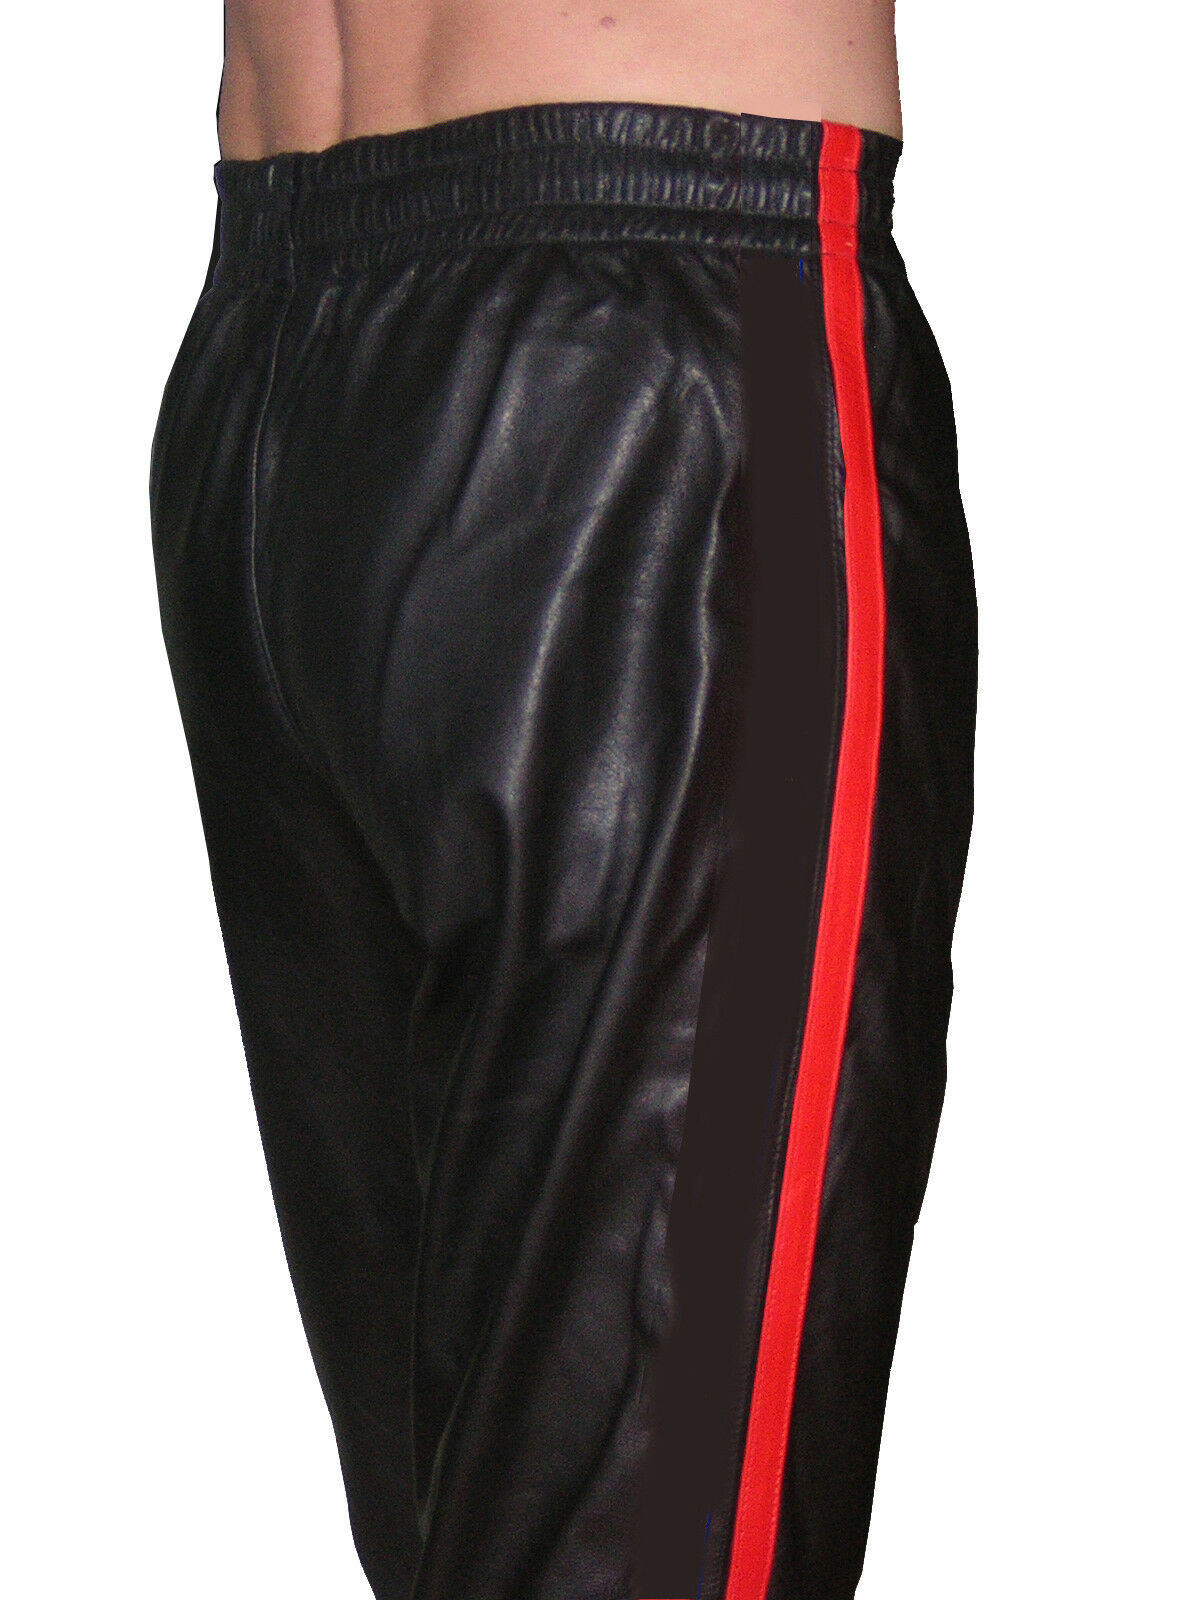 Sporthose schwarz rot Hose Leder Jogginghose neu casual sport leather pants